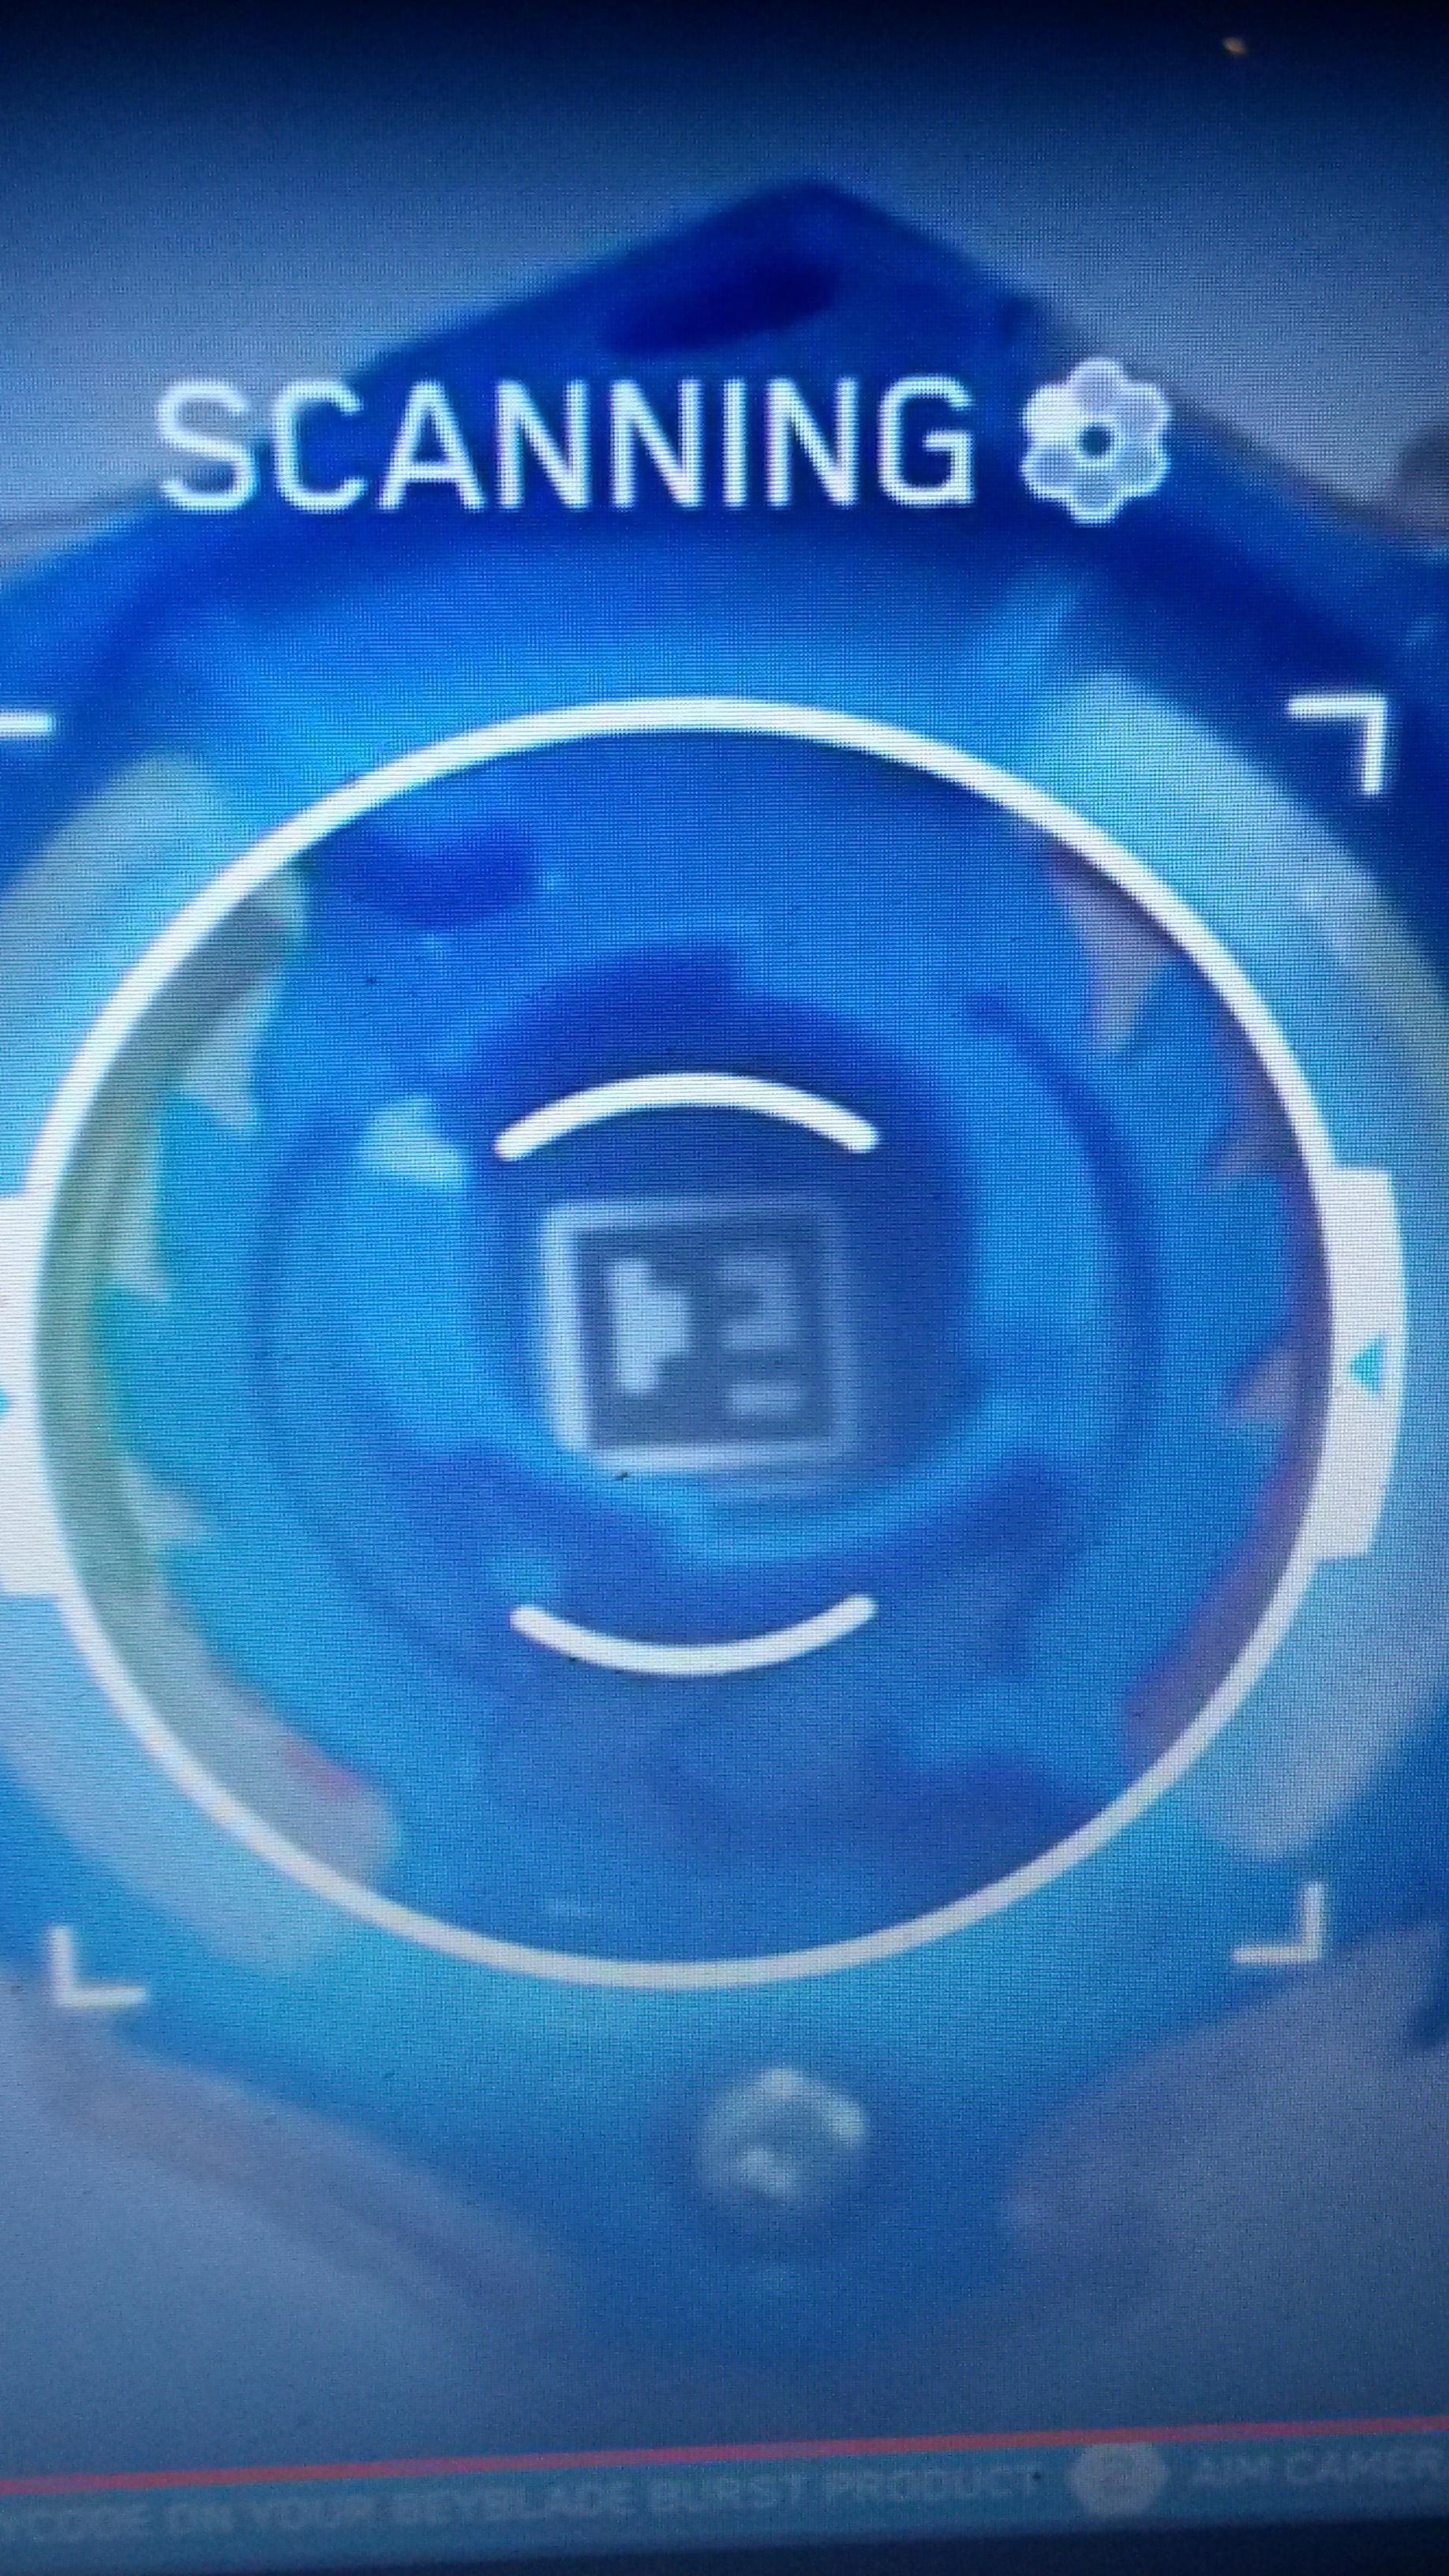 Code D2 Burst Qr Beyblade Doomscizor | Coding, Beyblade Burst, Qr Code